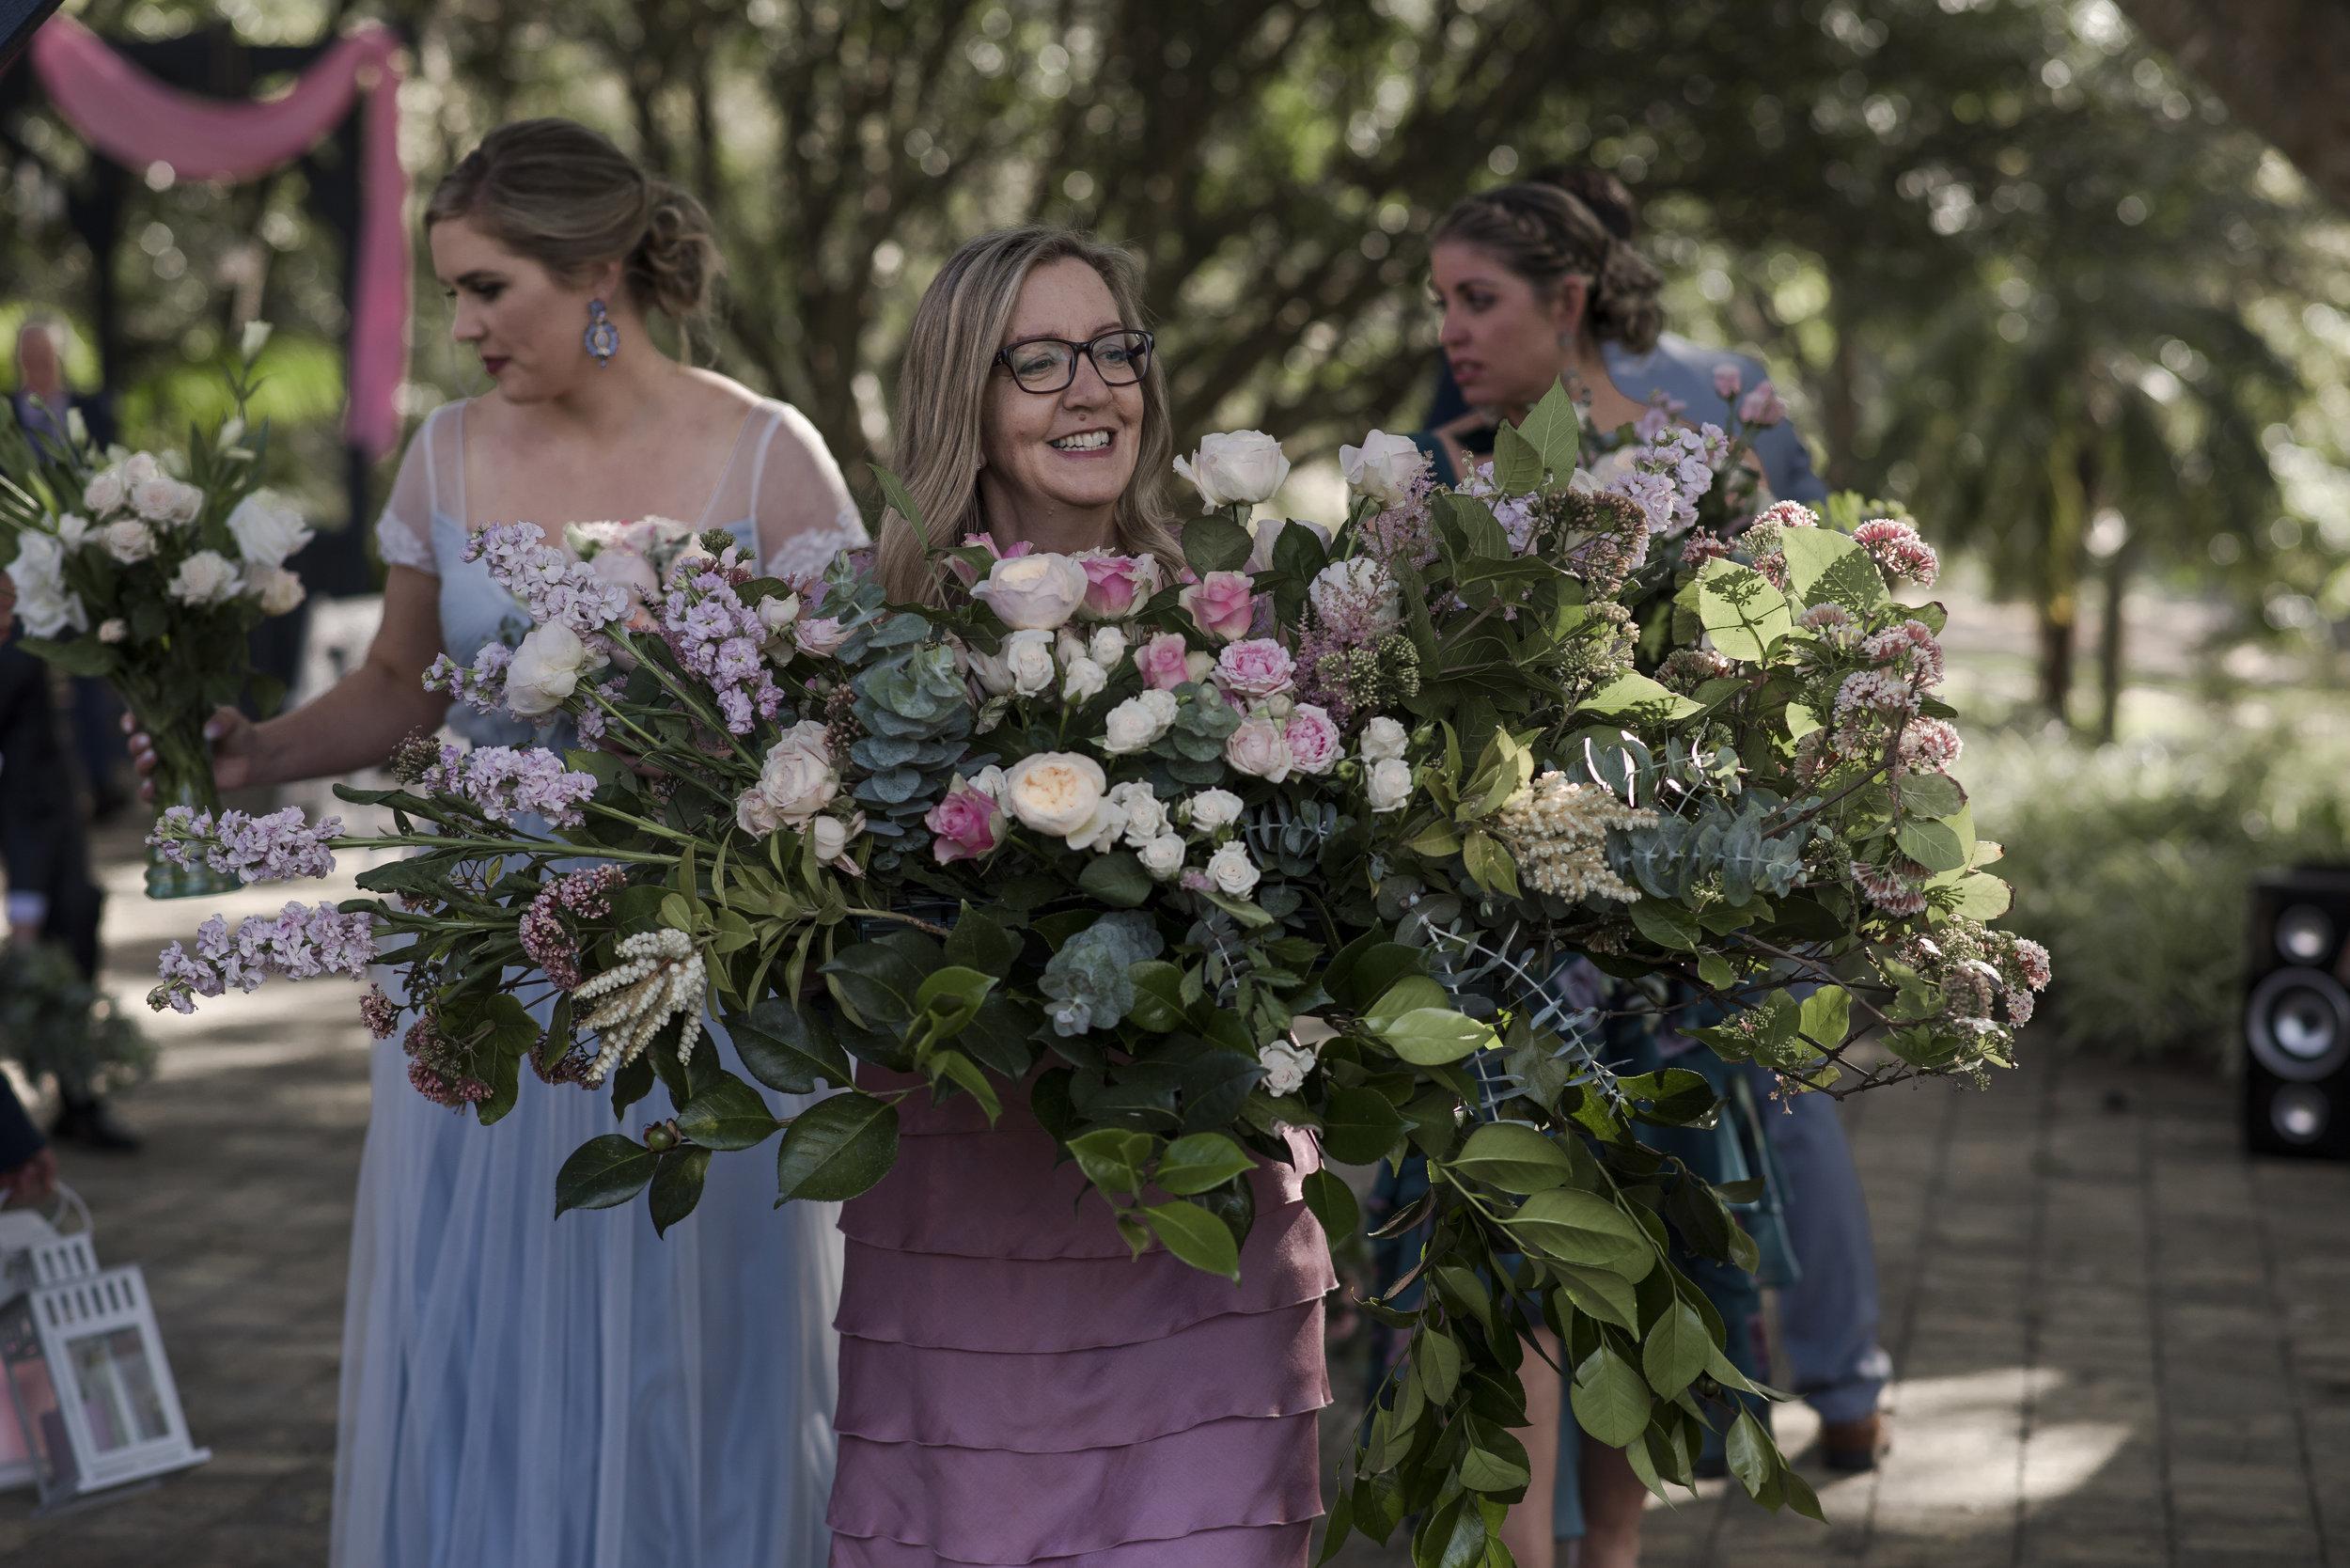 Teagan_Mayflower Weddings Photography_043.jpg